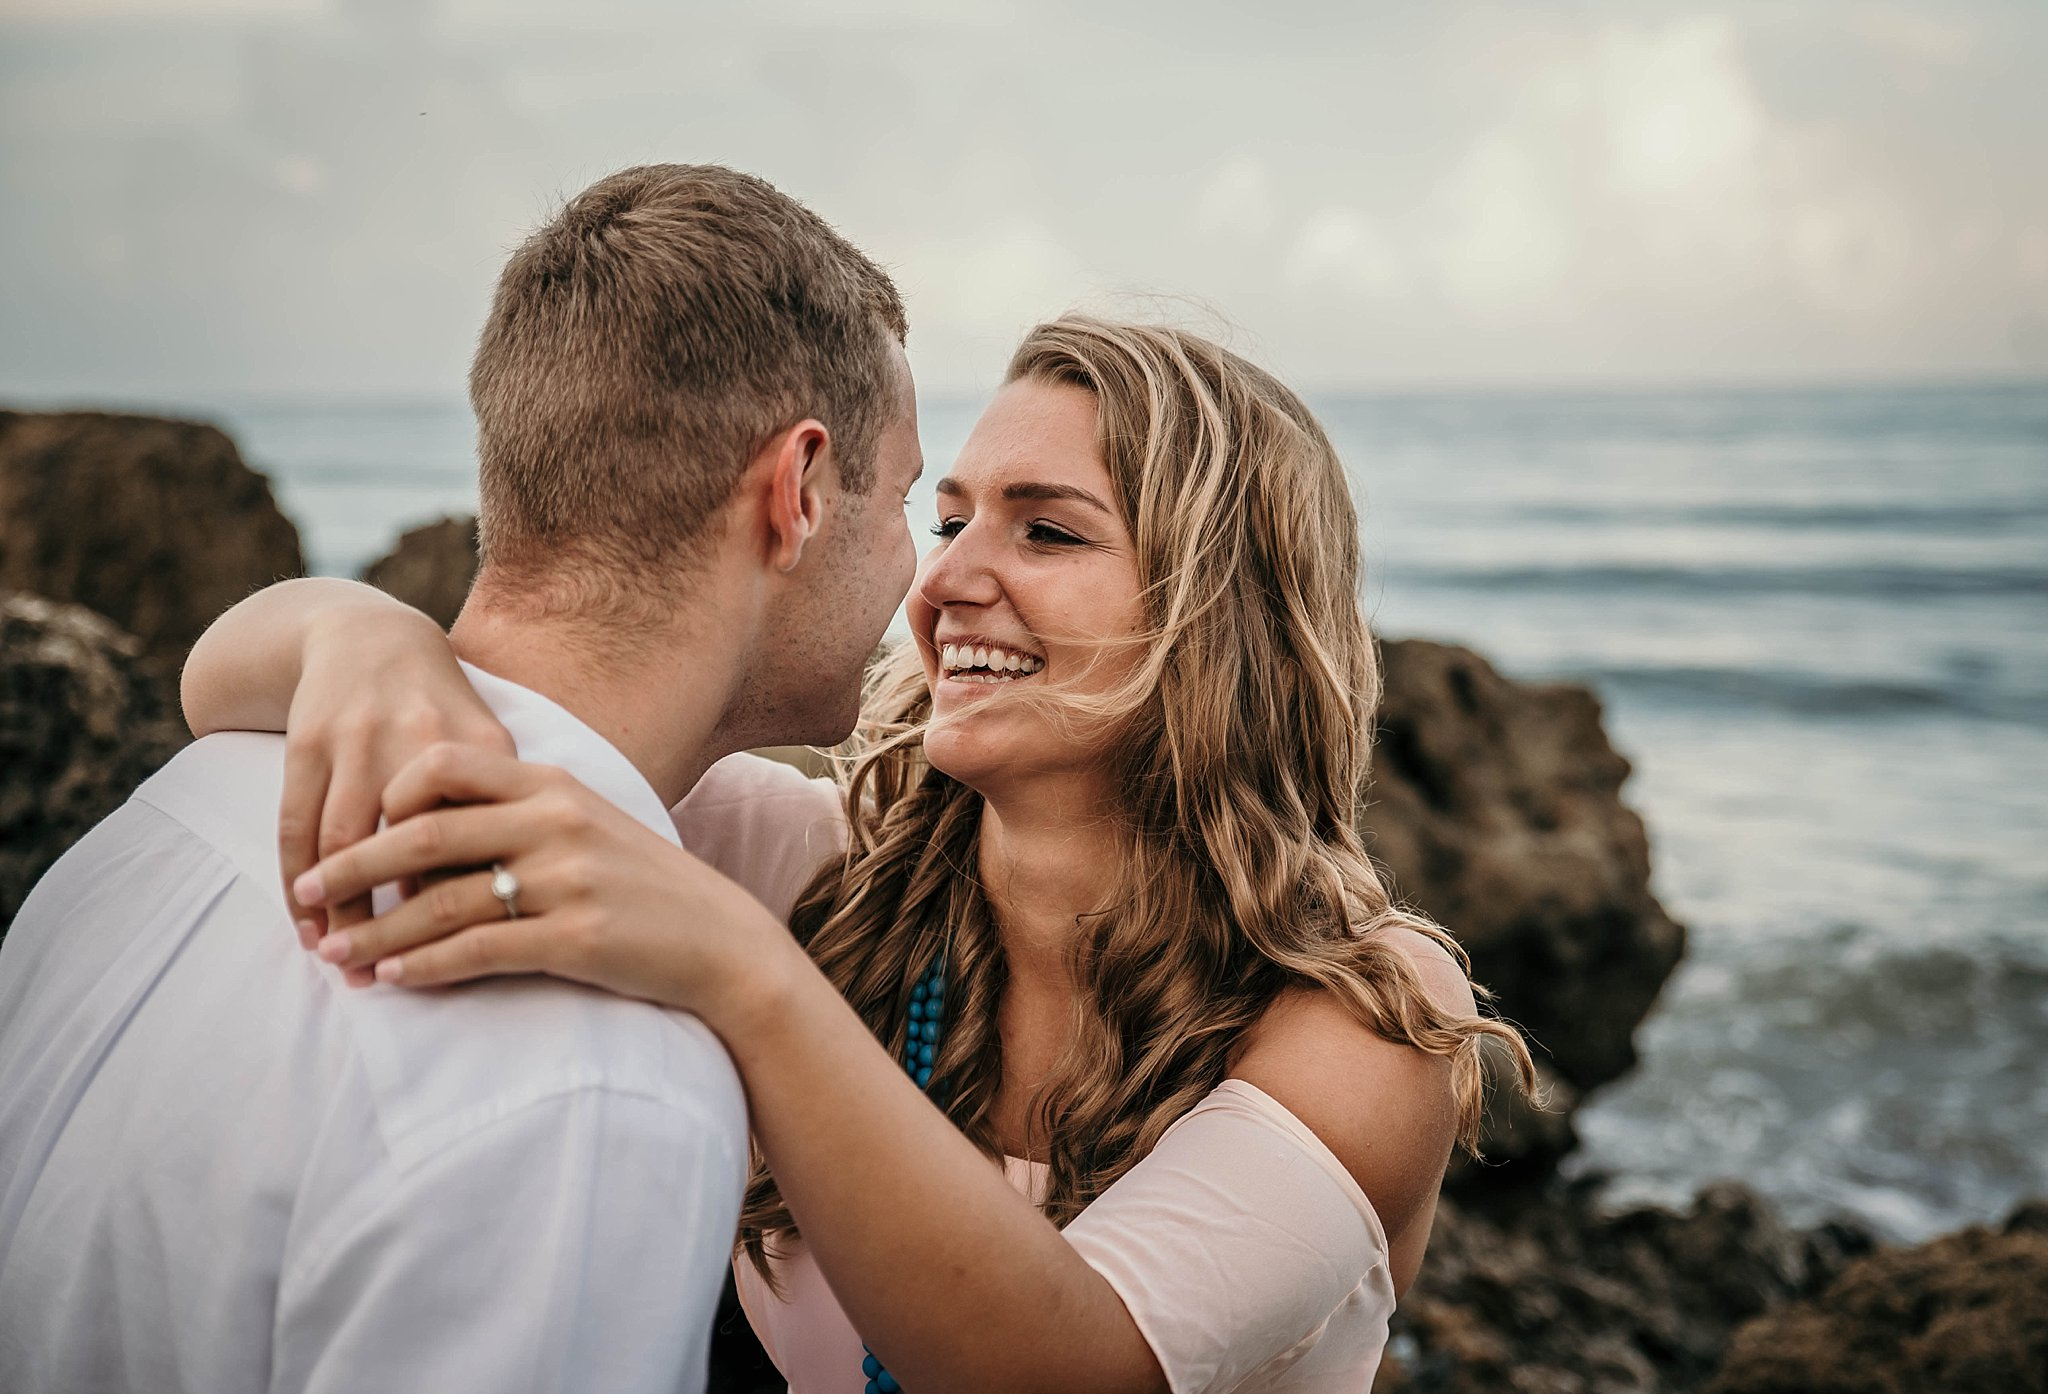 palm-beach-engagement-photos-florida-wedding-photographer_0040.jpg